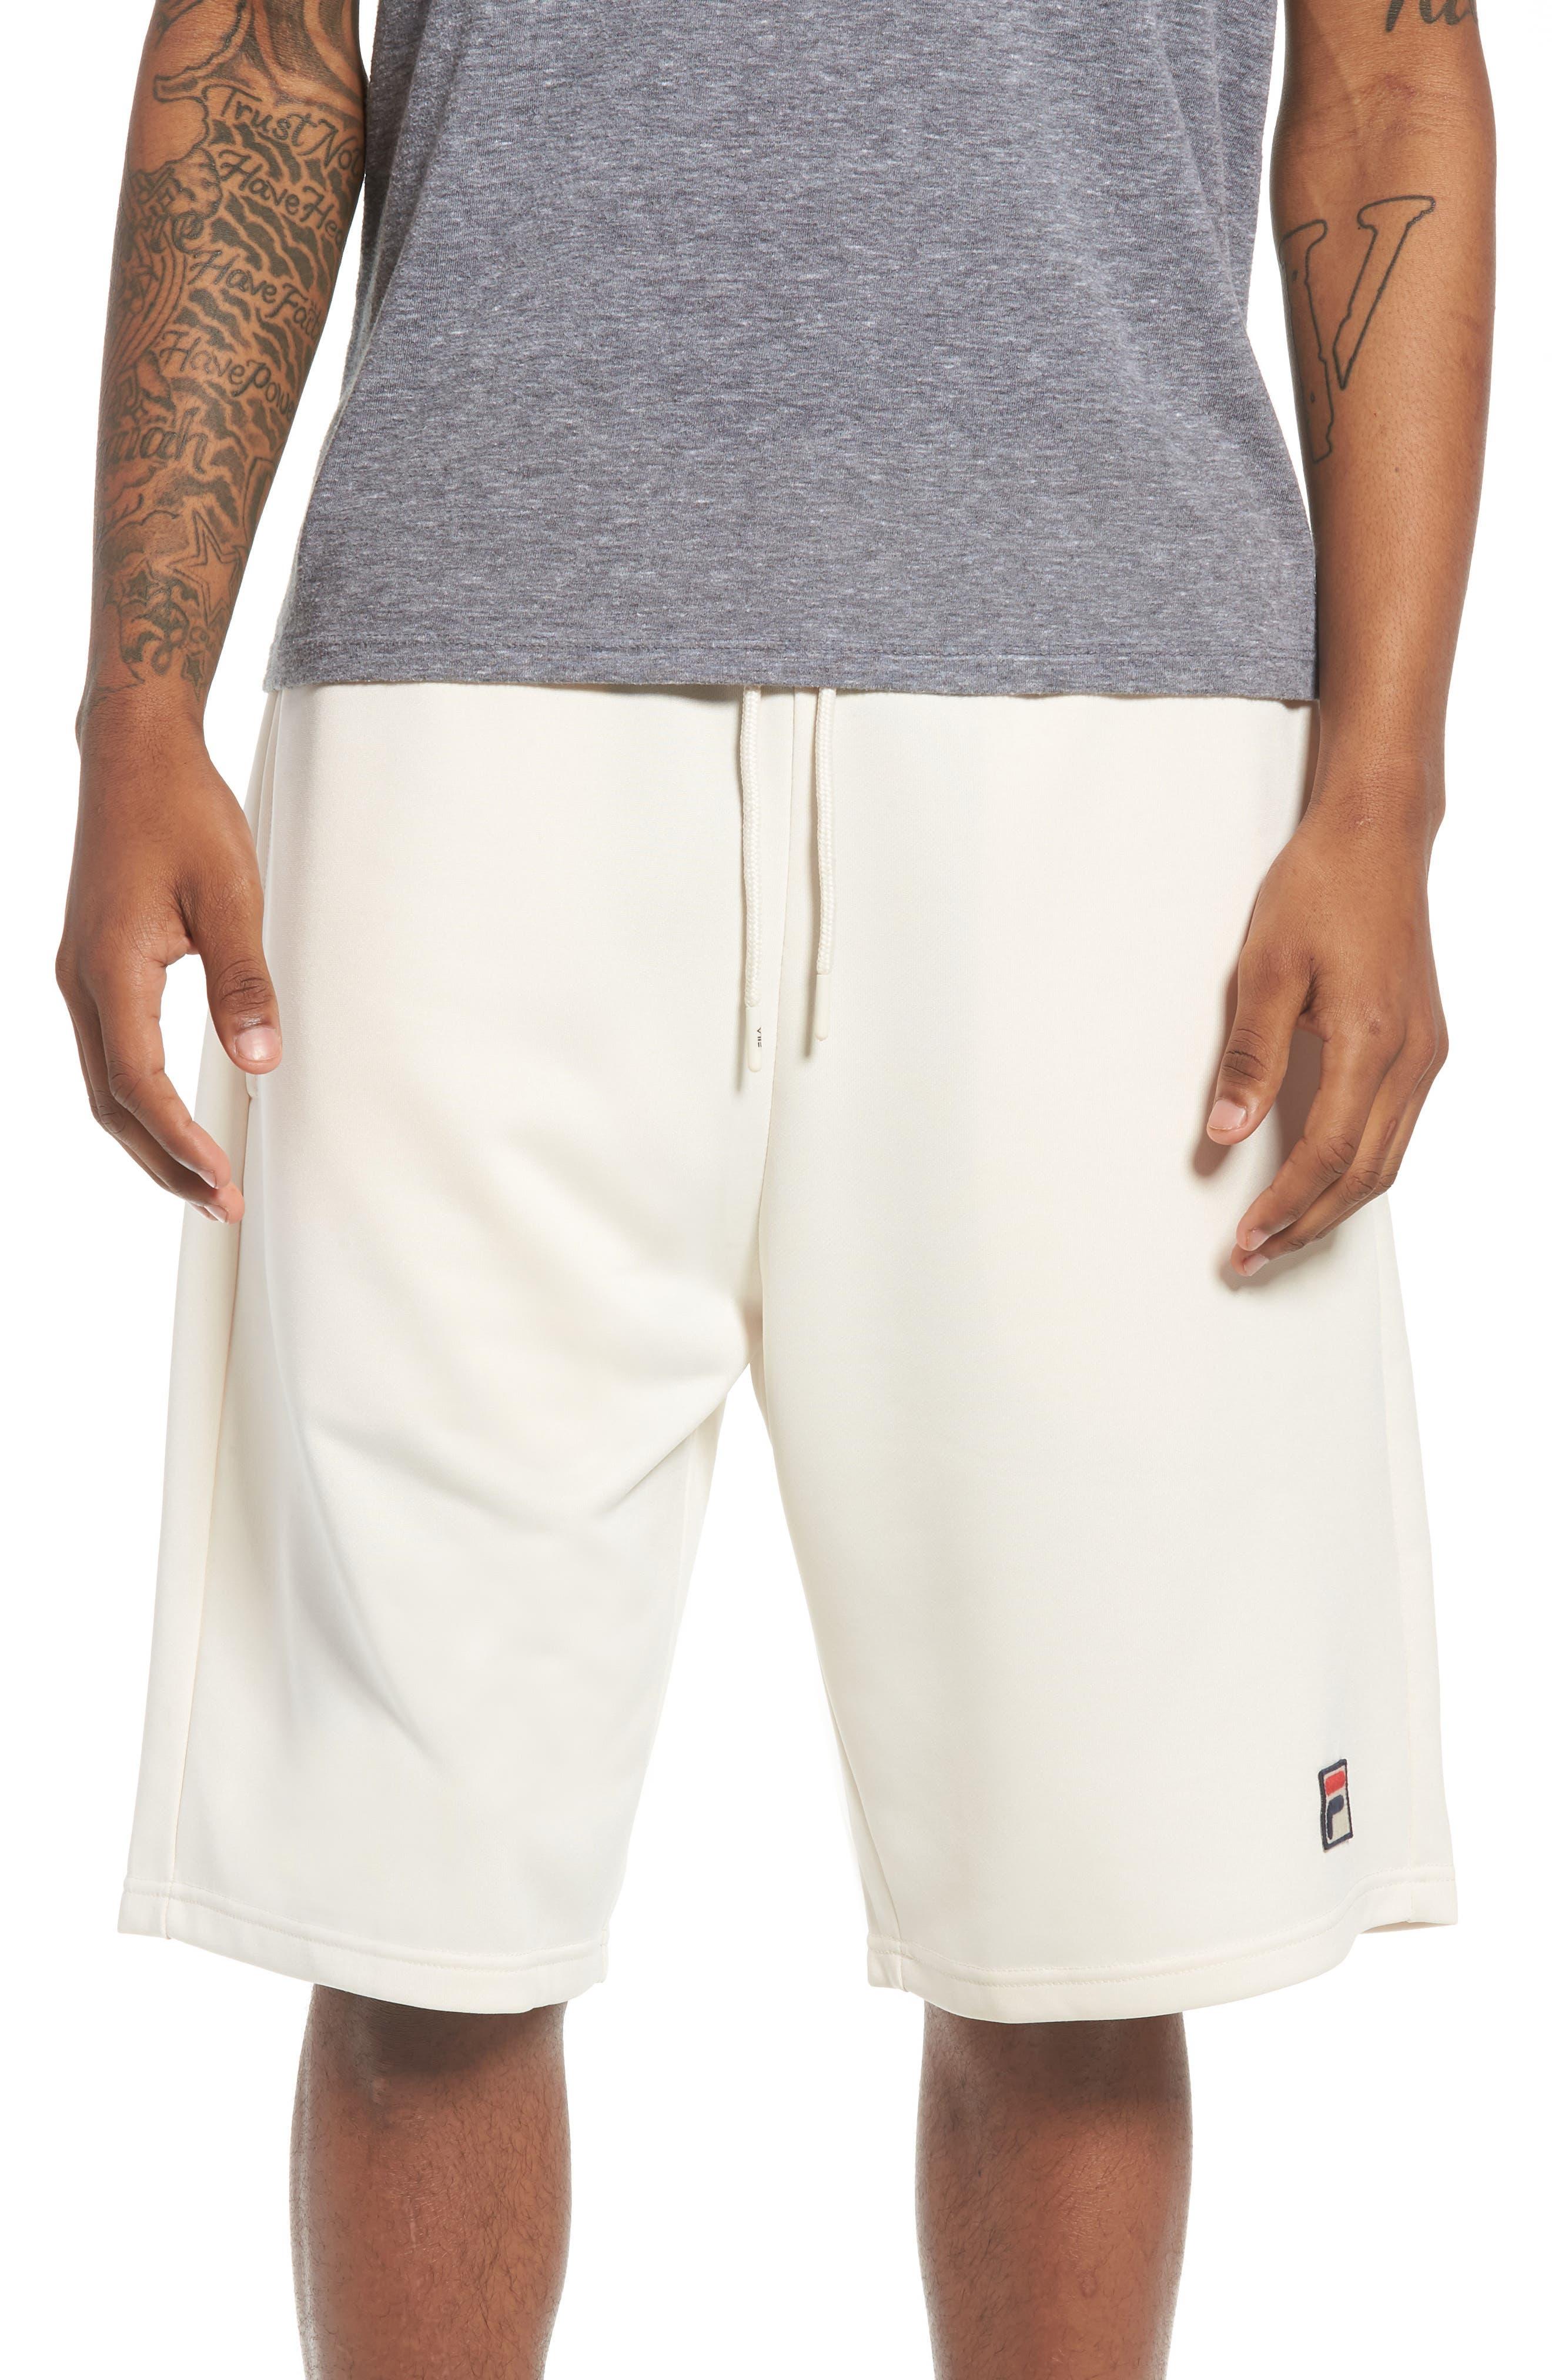 Dominico Shorts,                         Main,                         color, Gardenia